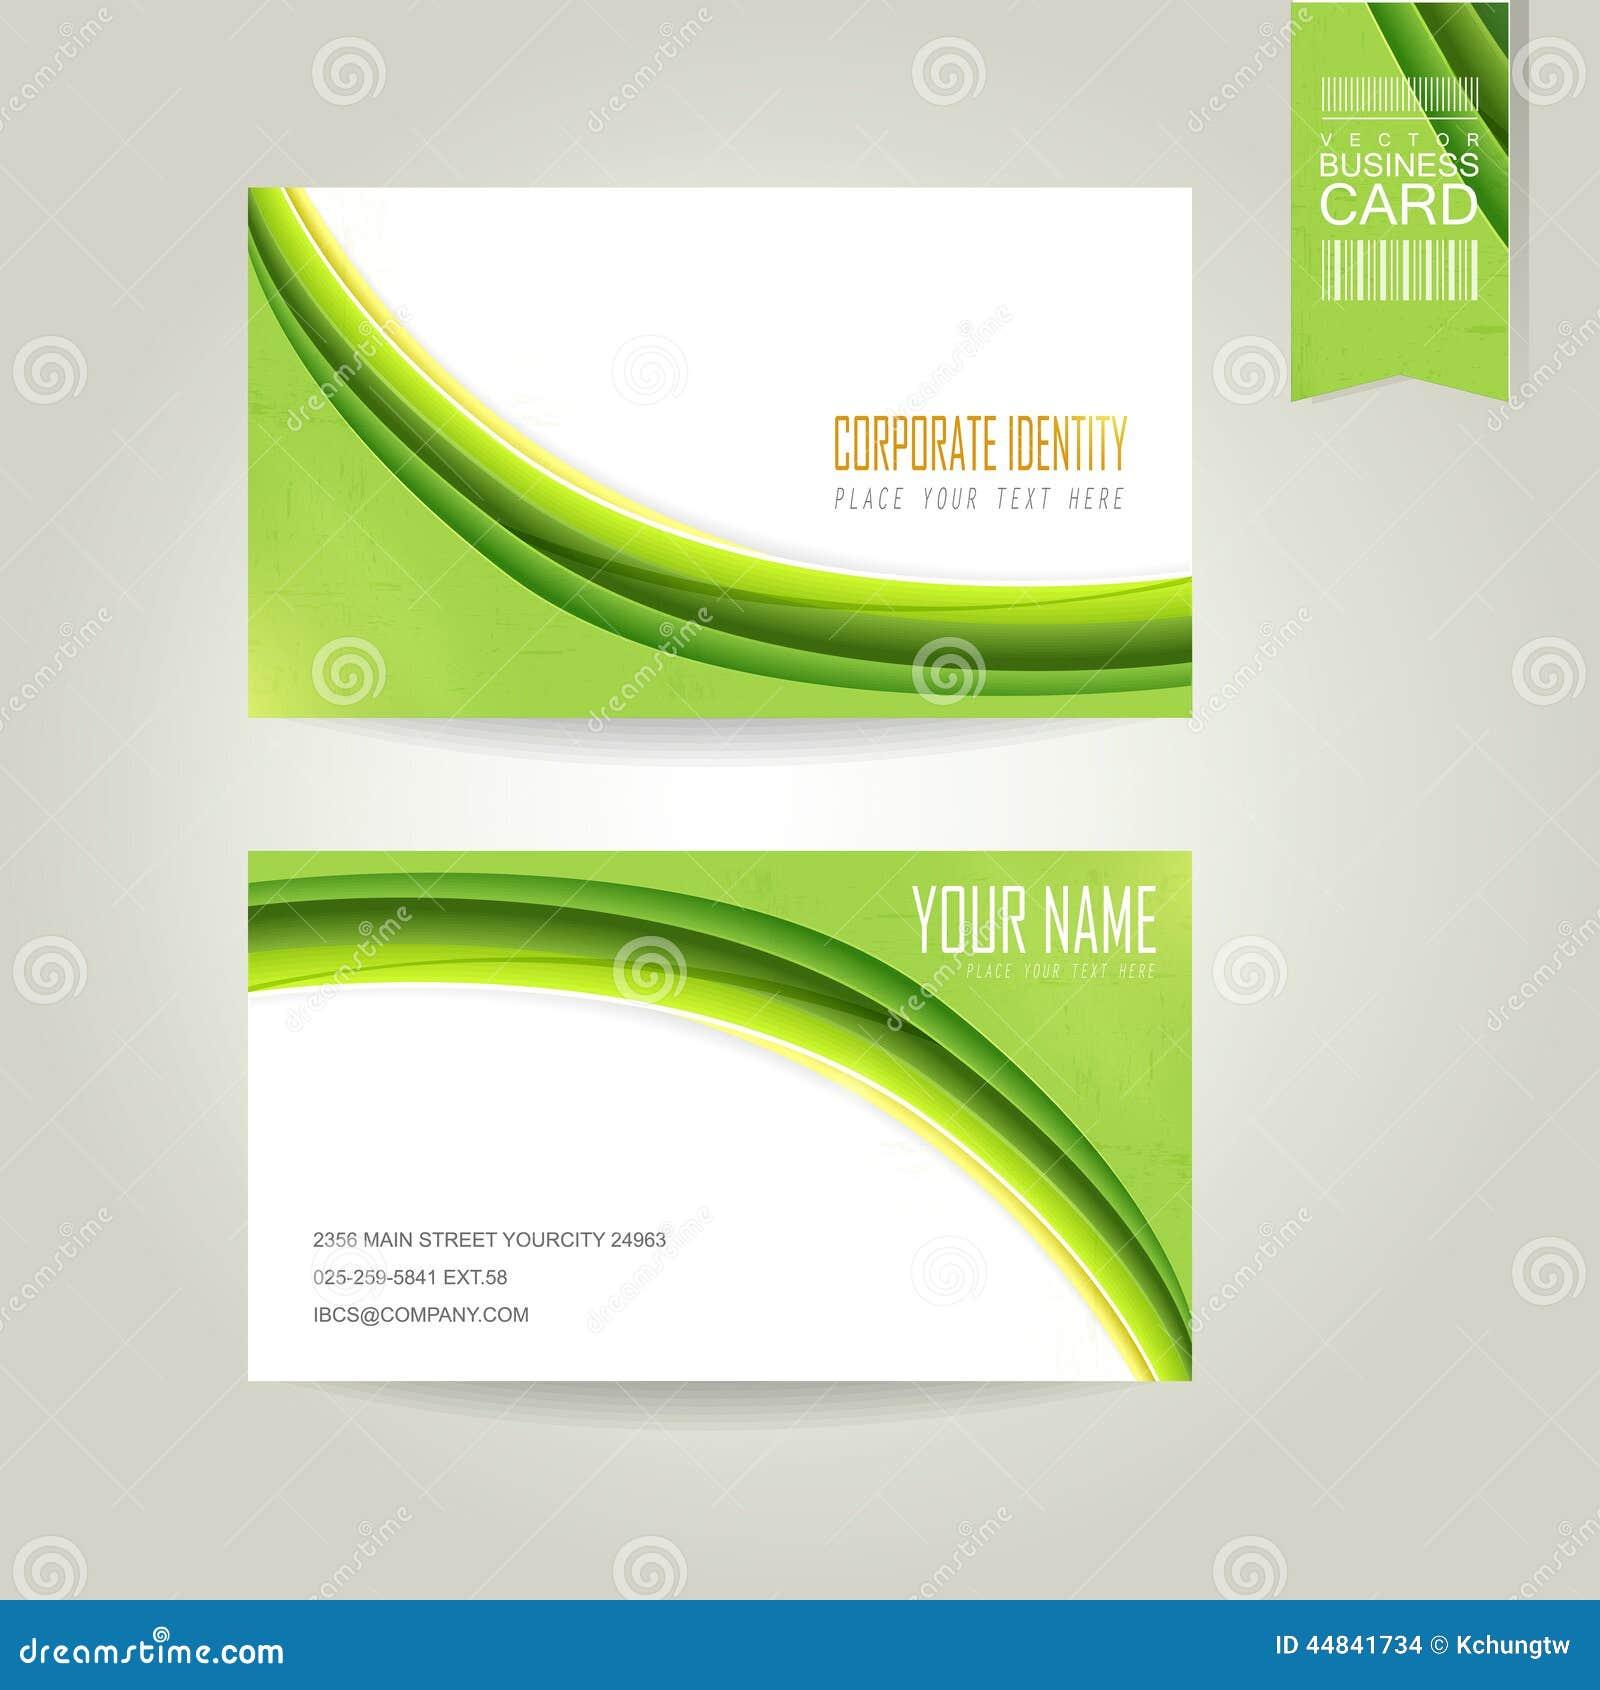 Green Business Card Background - ezmoney88